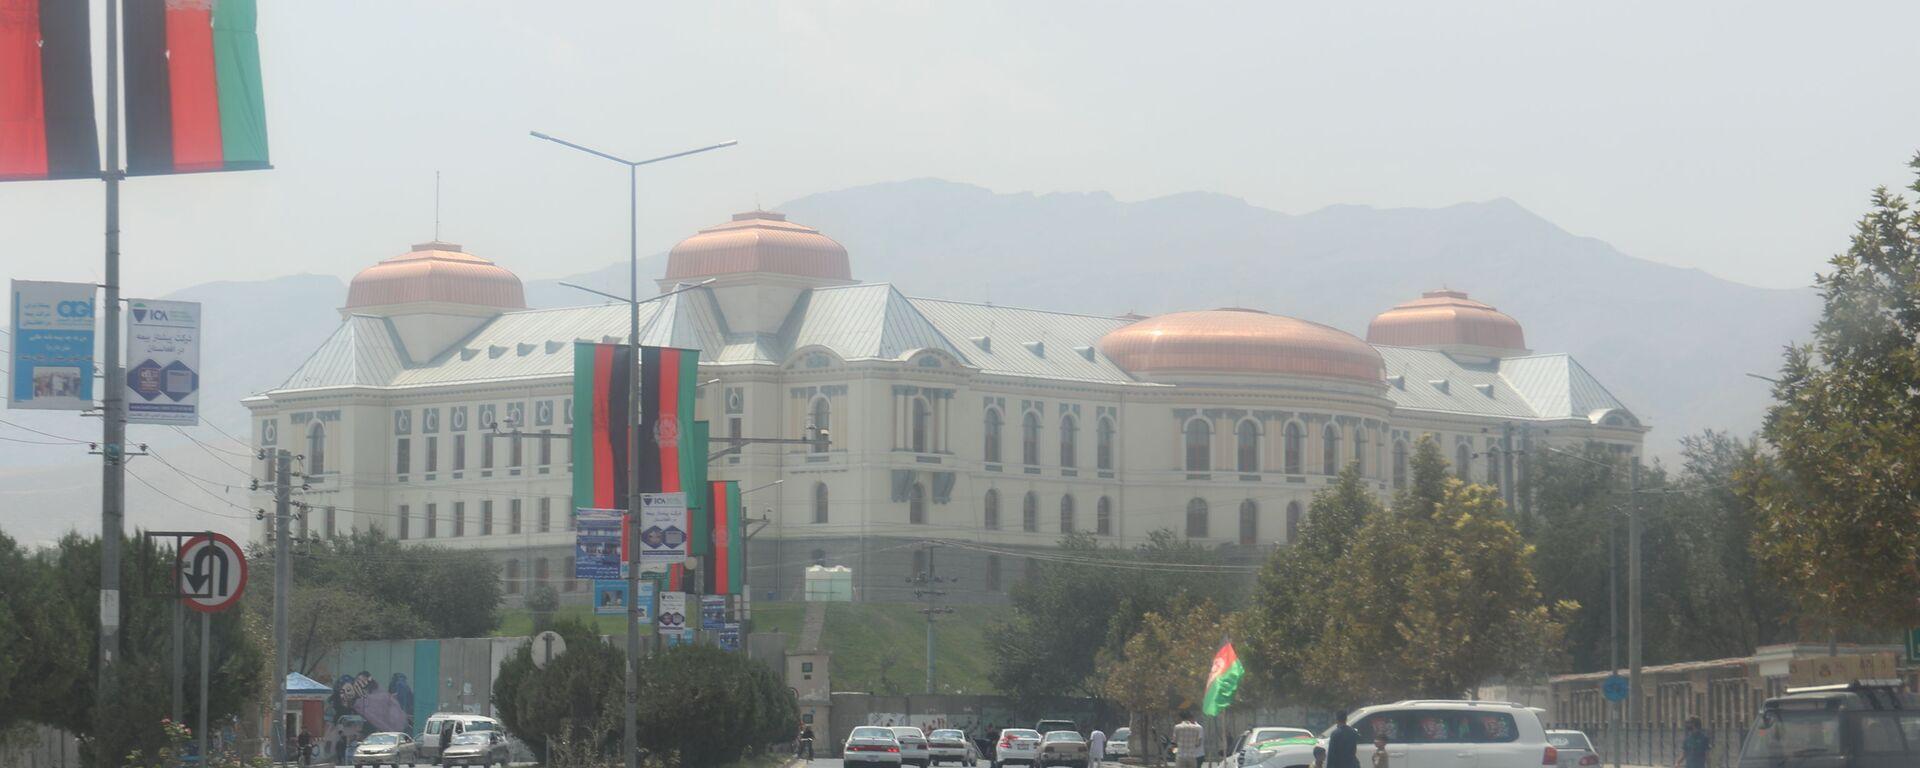 Празднование дня независимости в Кабуле - Sputnik Таджикистан, 1920, 15.08.2021